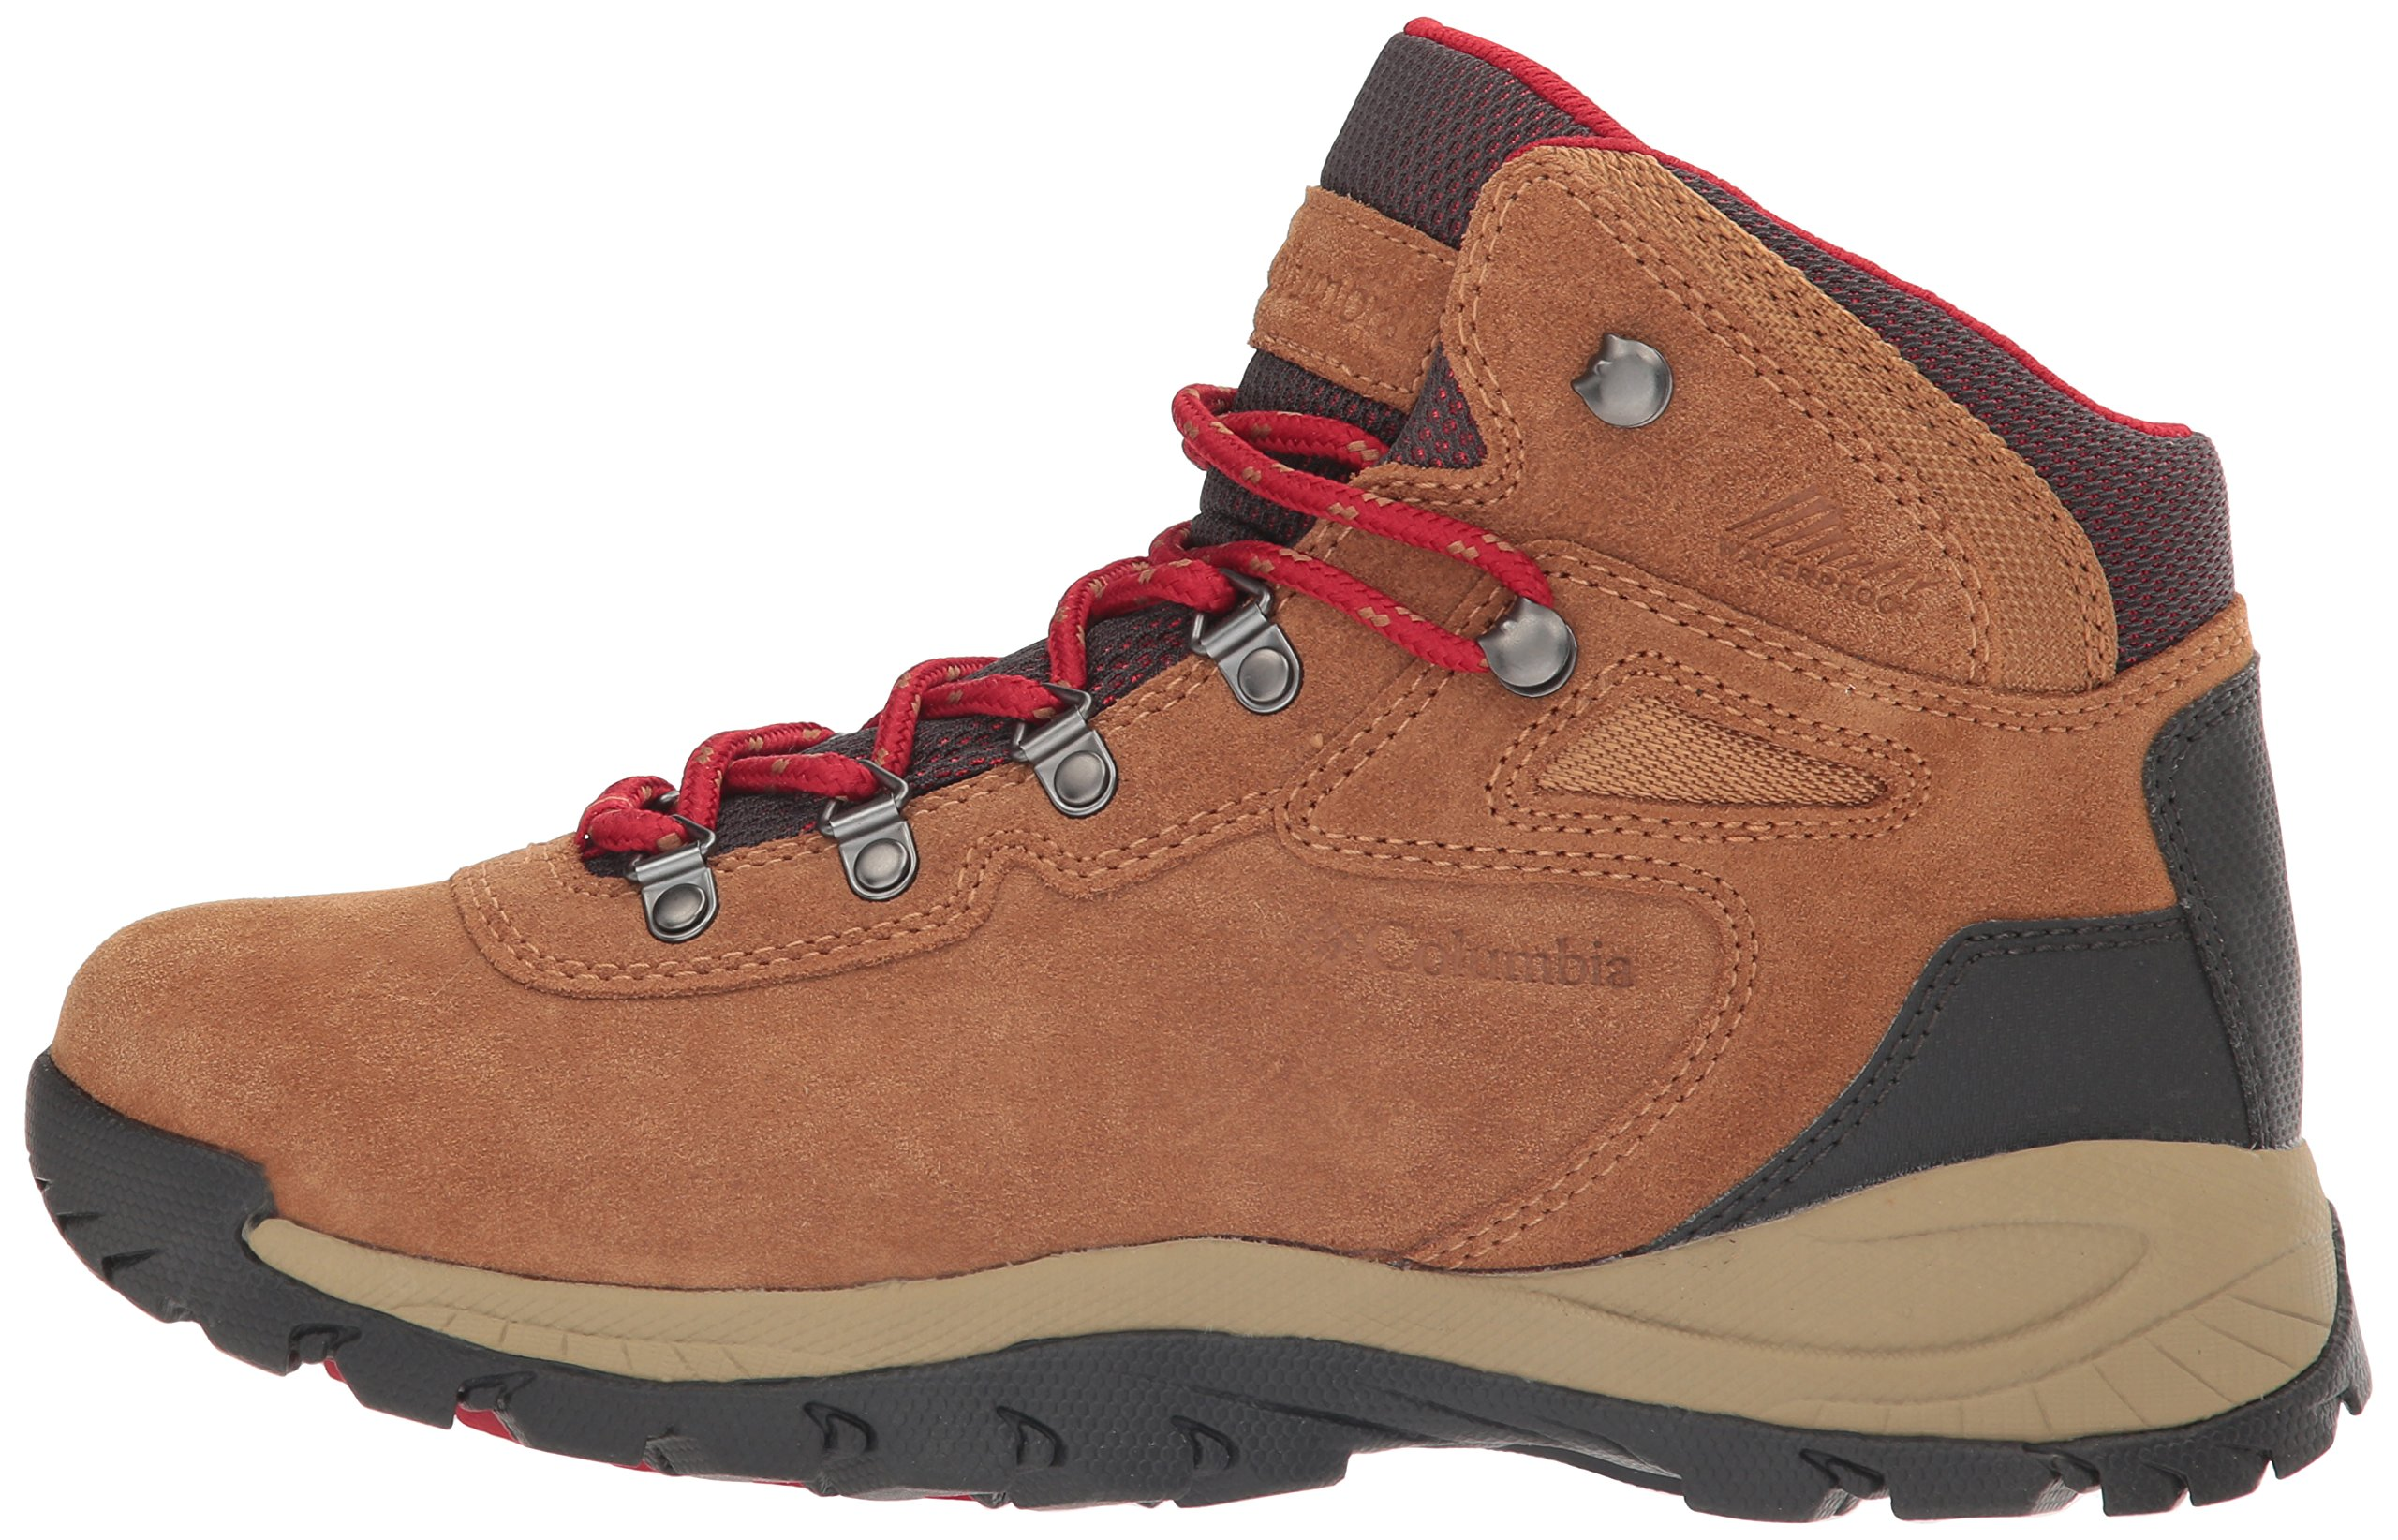 Columbia Women's Newton Ridge Plus Waterproof Amped Hiking Boot, Elk, Mountain Red, 7.5 B US by Columbia (Image #5)